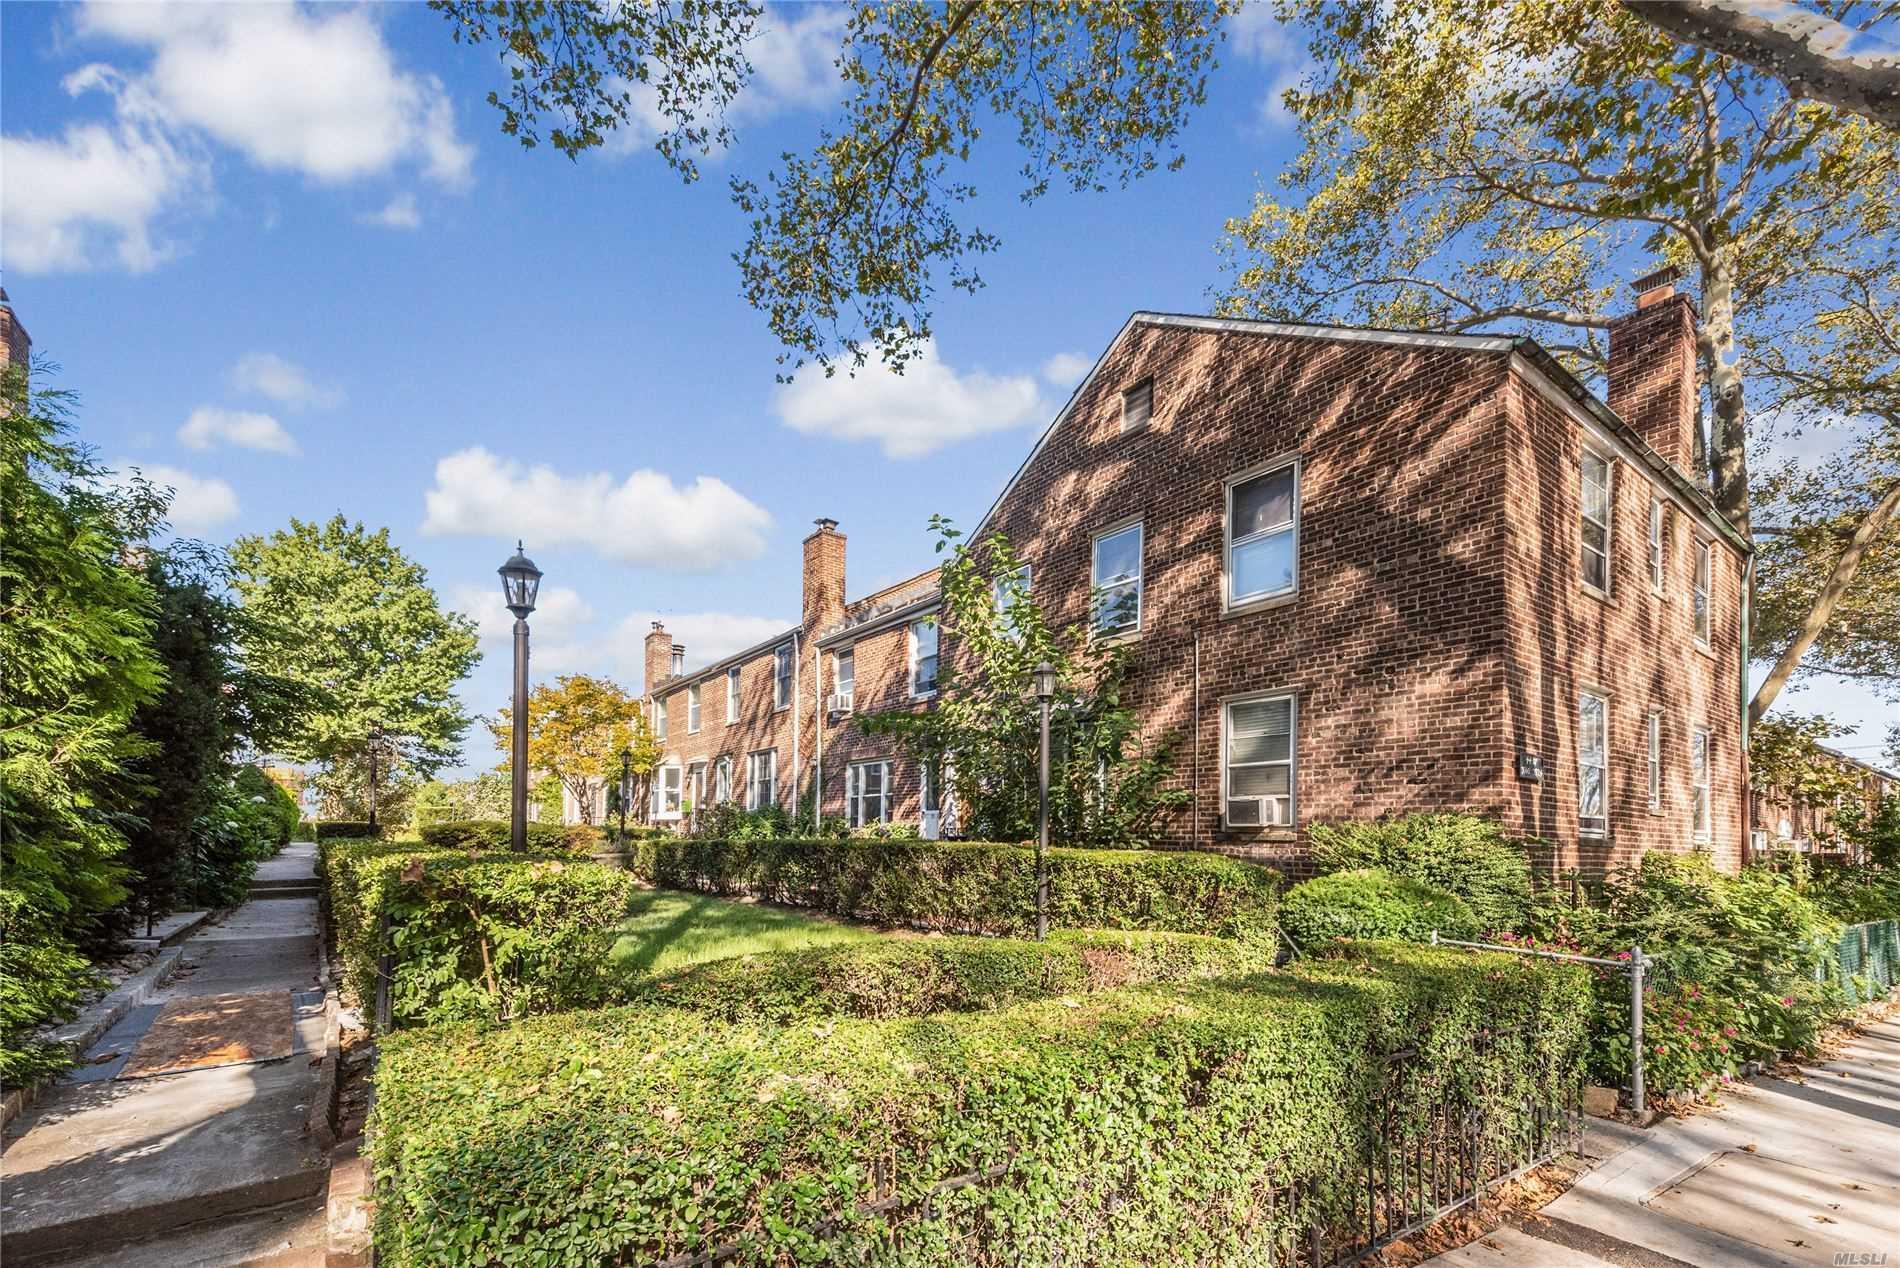 Property for sale at 39-18 44th Street, Sunnyside NY 11104, Sunnyside,  New York 11104